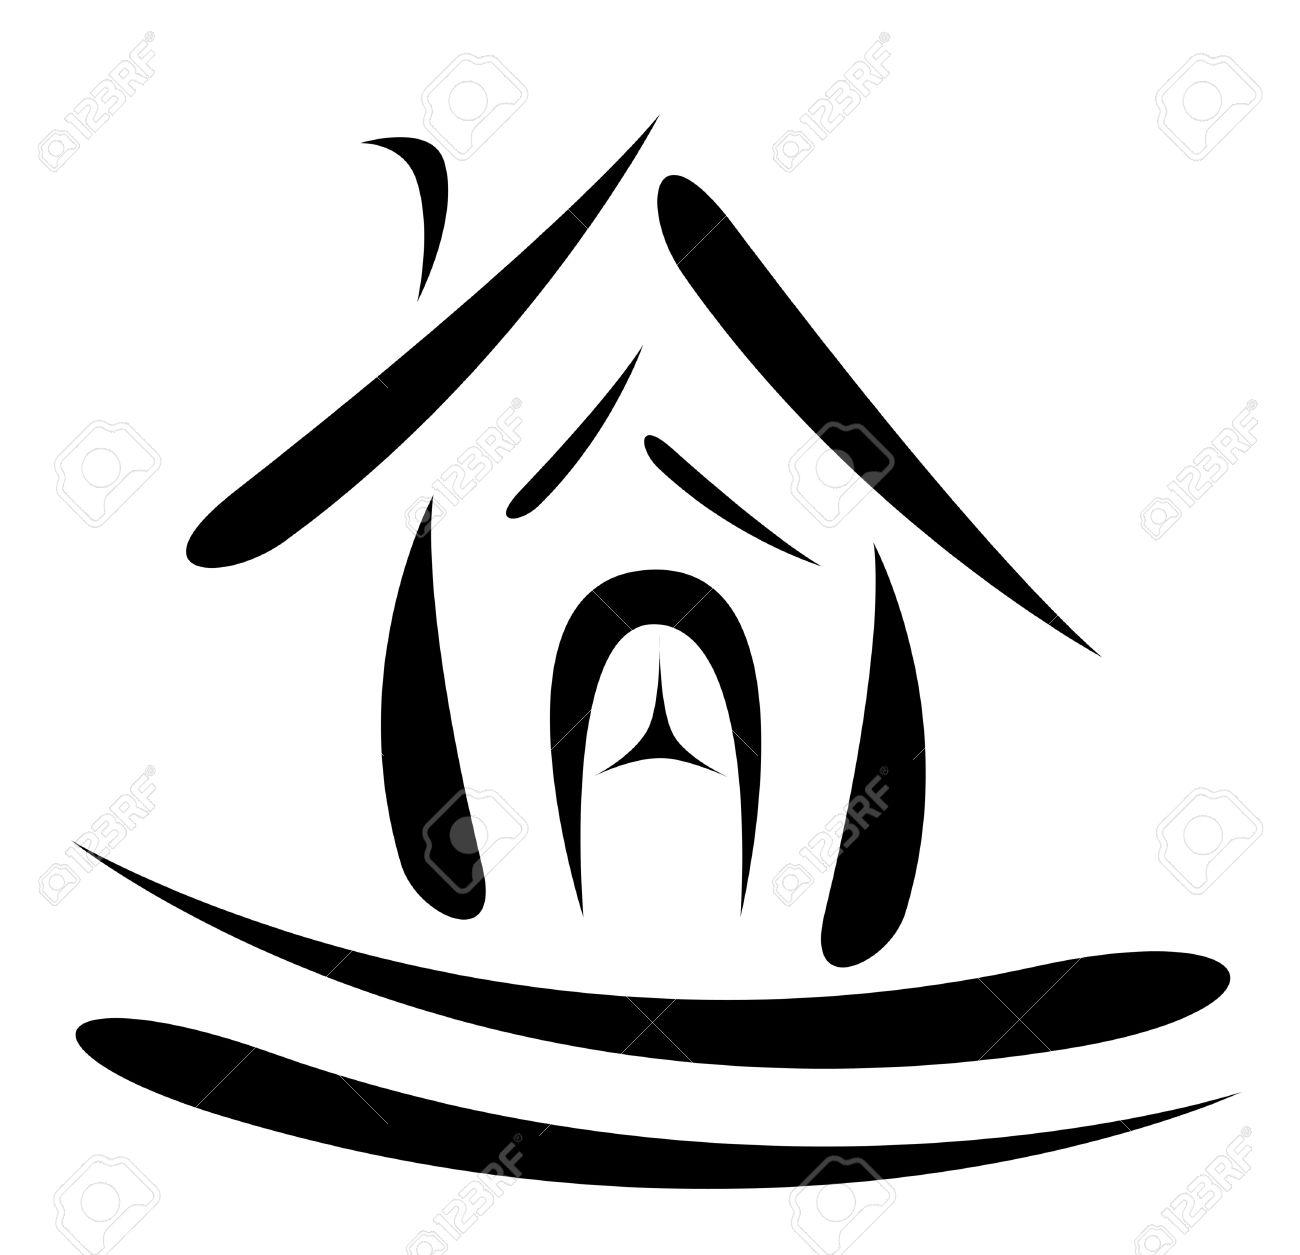 abstract house symbol Stock Photo - 13533175